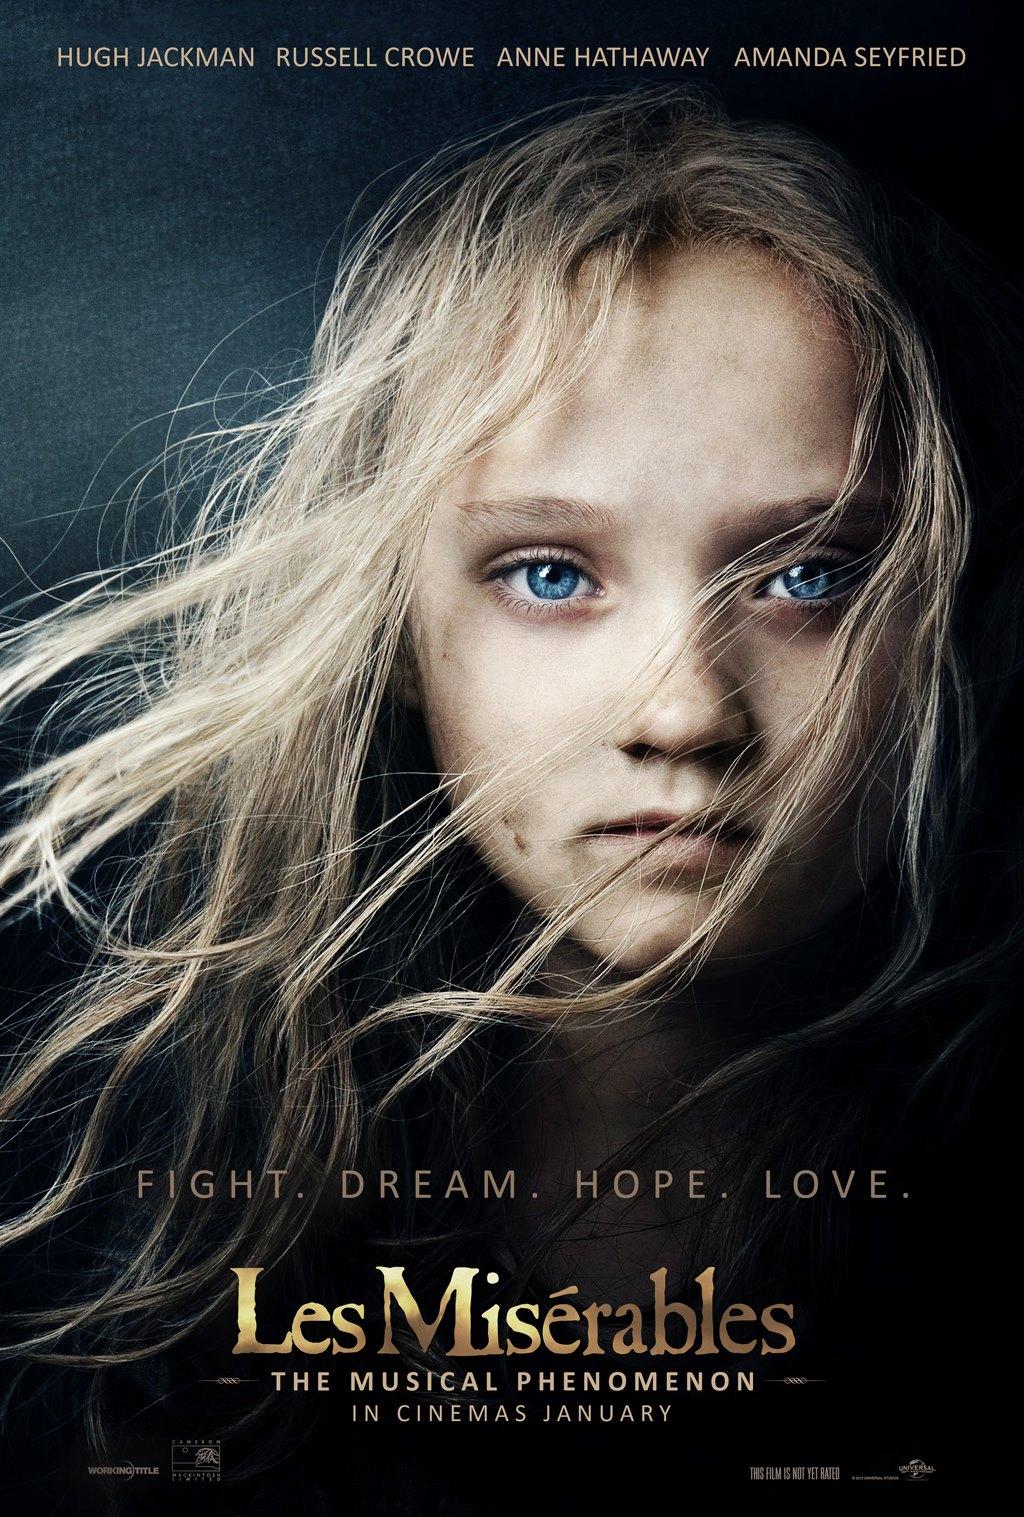 http://2.bp.blogspot.com/-OAl20BZFkFc/UGnfJ5bvgyI/AAAAAAAAFM8/V-w-oXjppCE/s1600/les-miserables-film-2012-poster.jpg